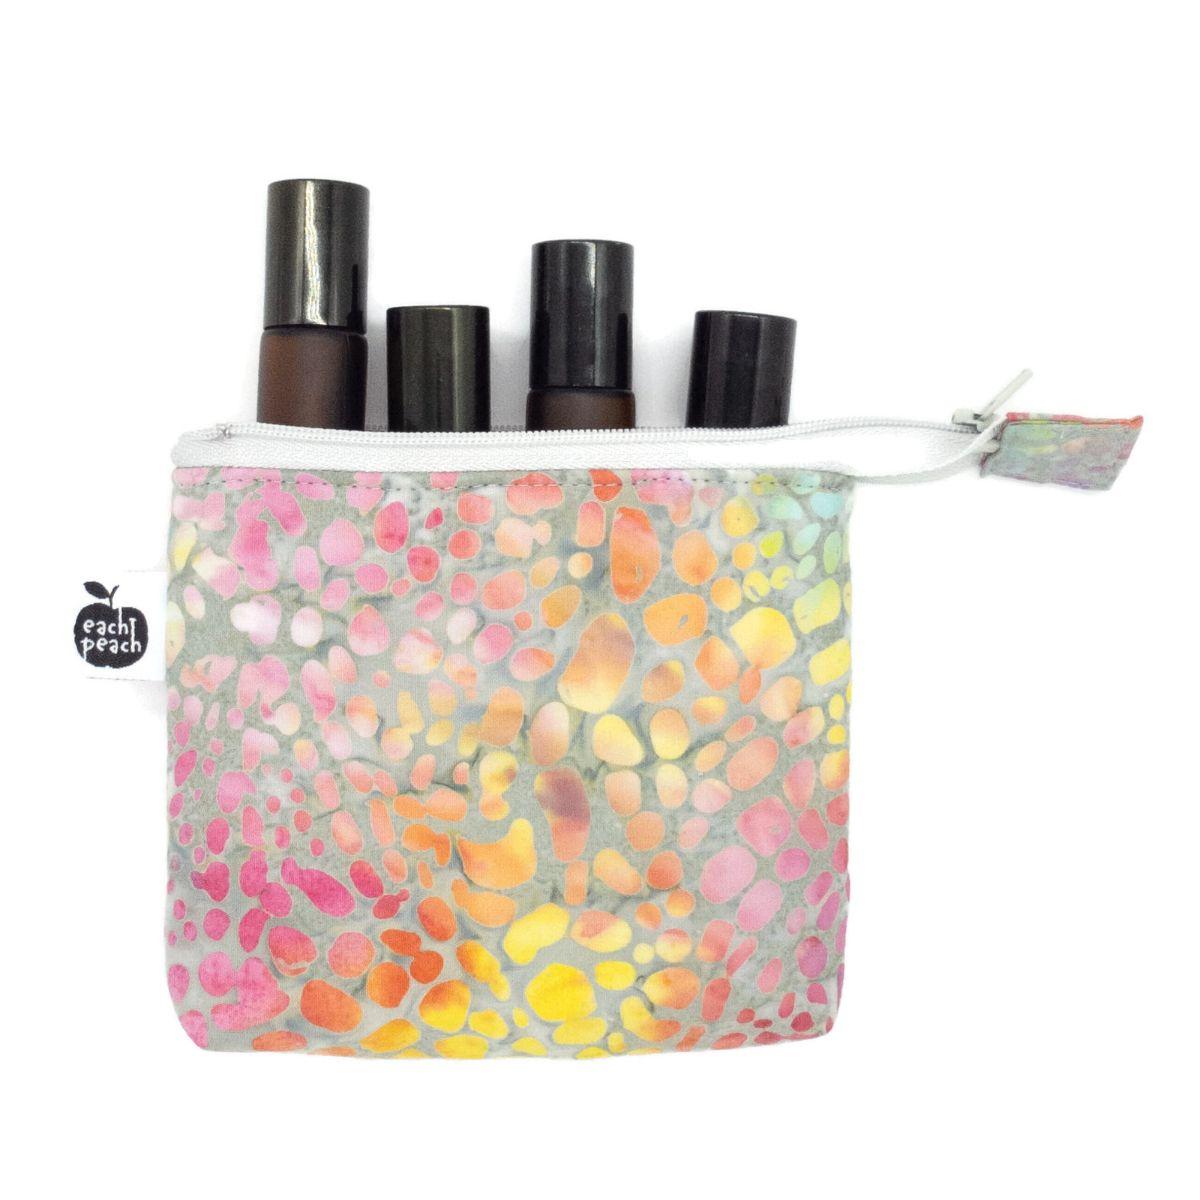 oils-travel-bag-rainbow-batik